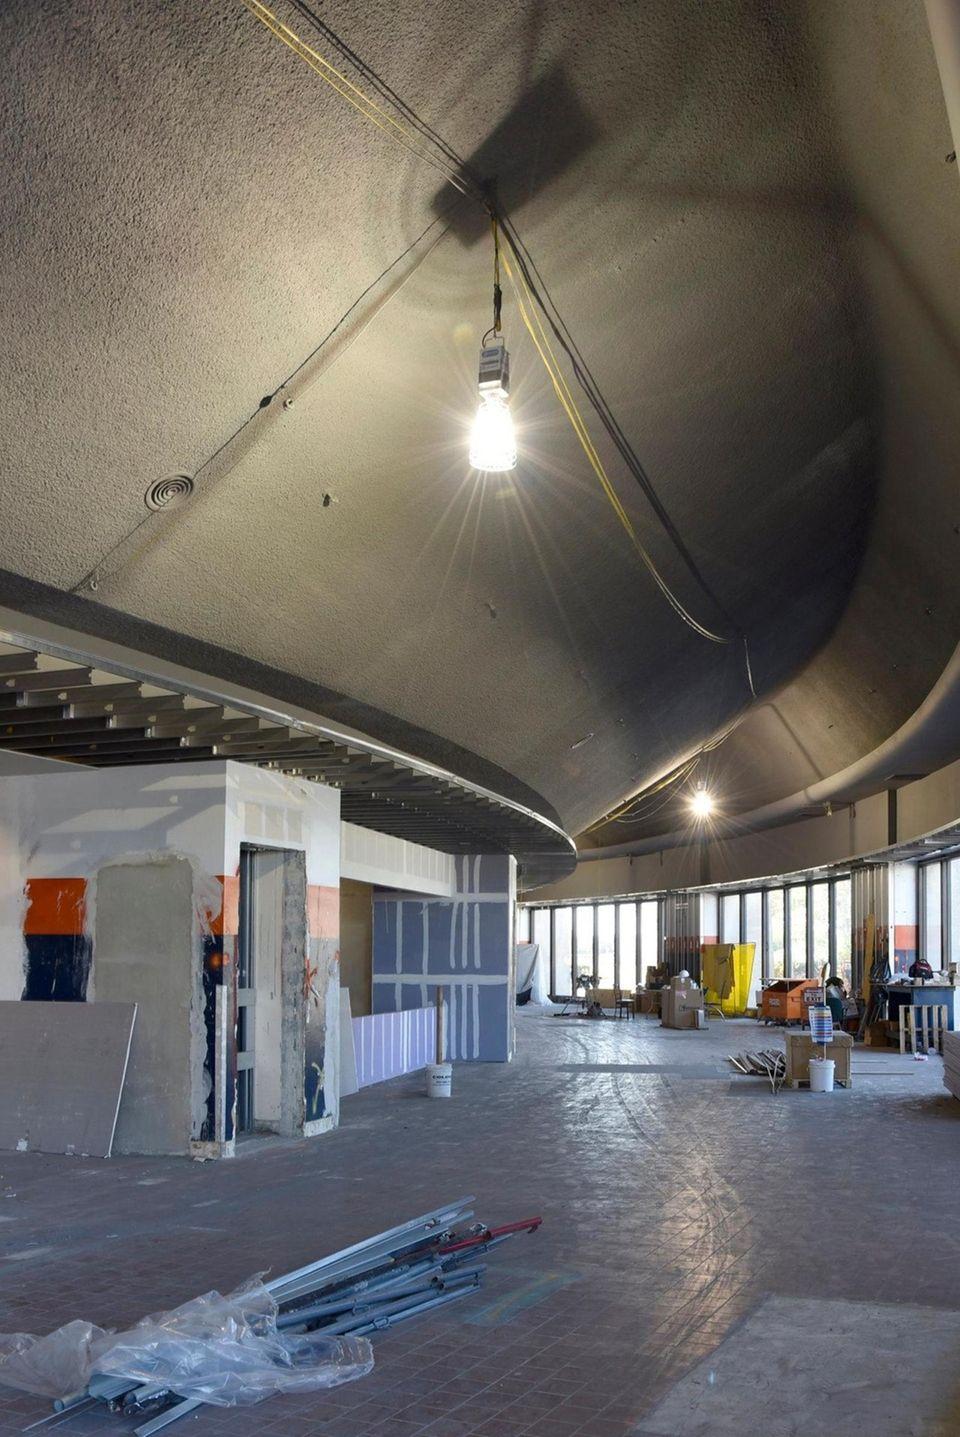 The Nassau Veterans Memorial Coliseum is undergoing renovation